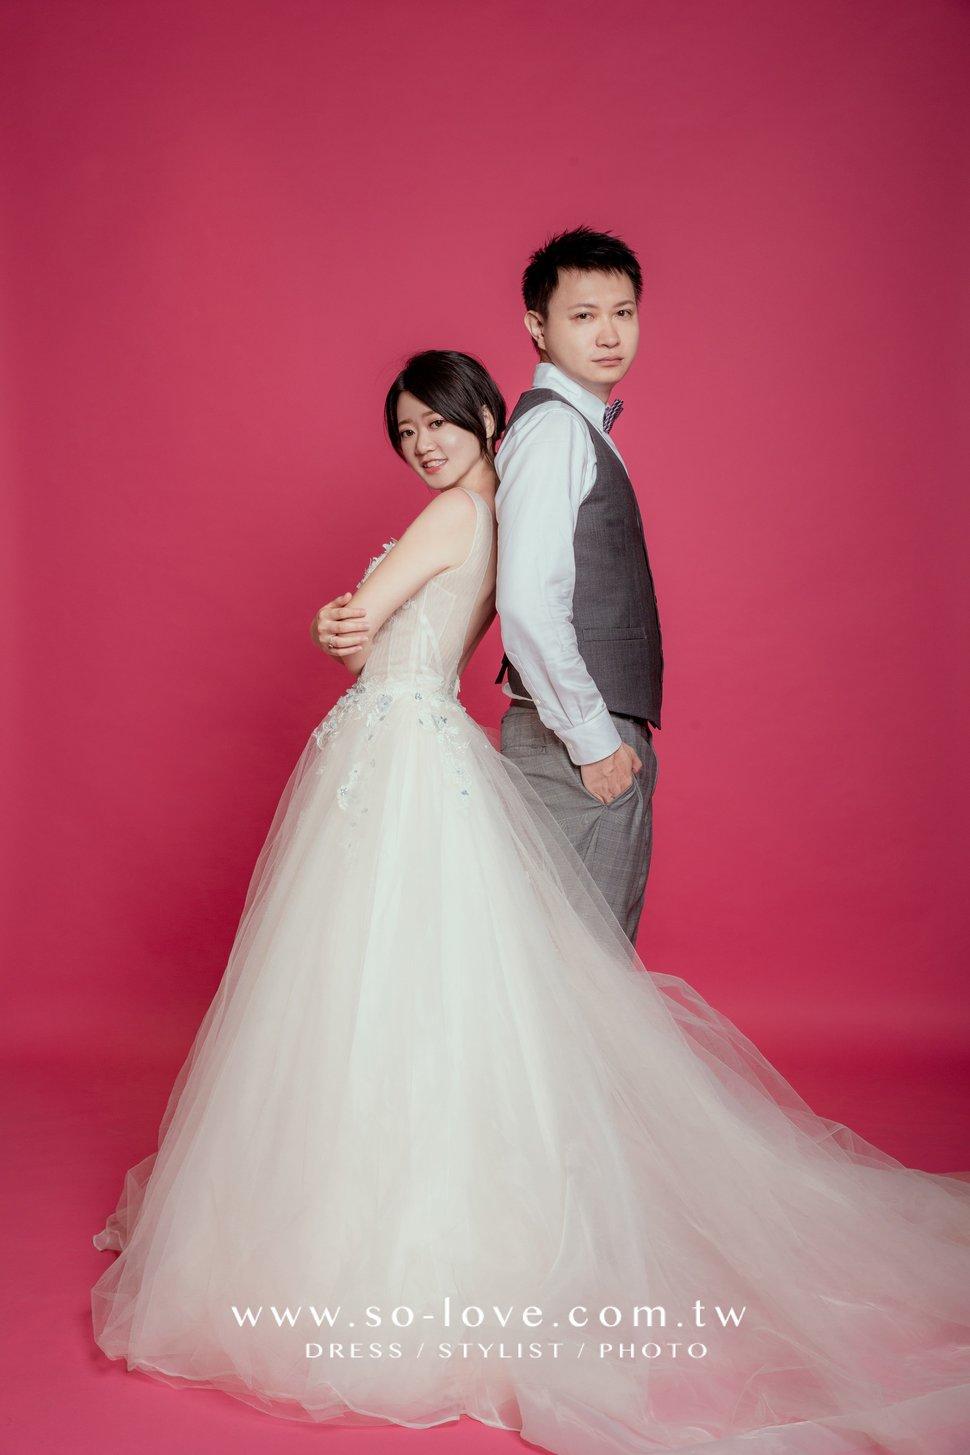 RCG2B1335 - So.Love Wedding 樂樂蕾絲《結婚吧》